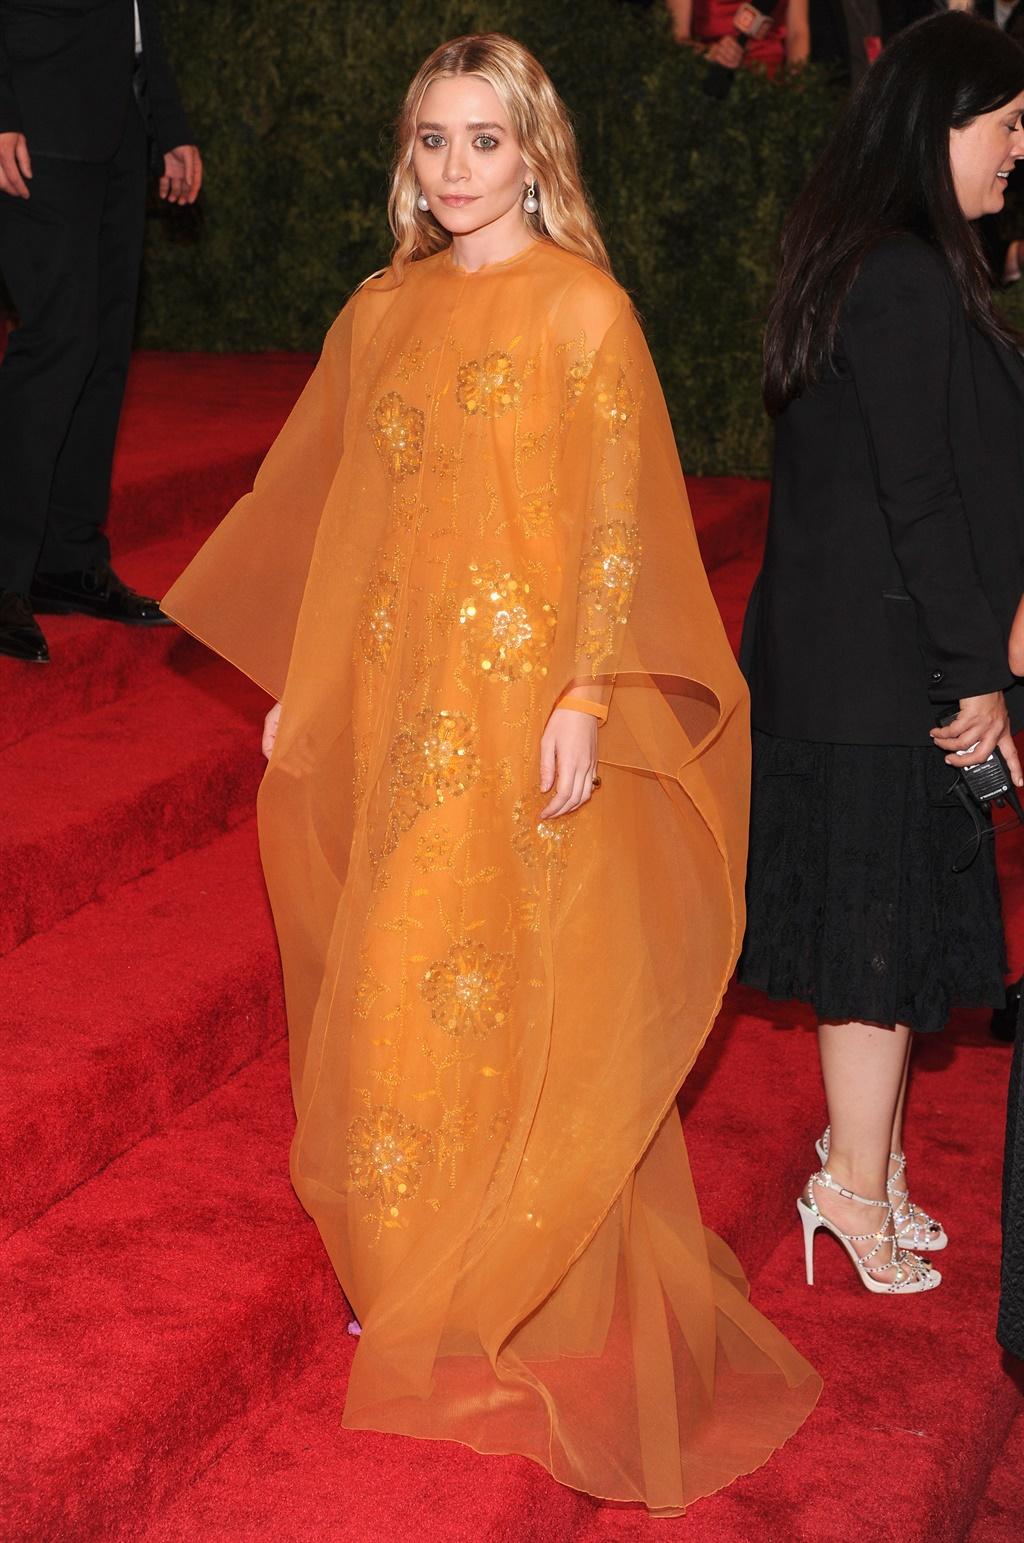 NEW YORK, NY - MAY 06: Ashley Olsen attends the C